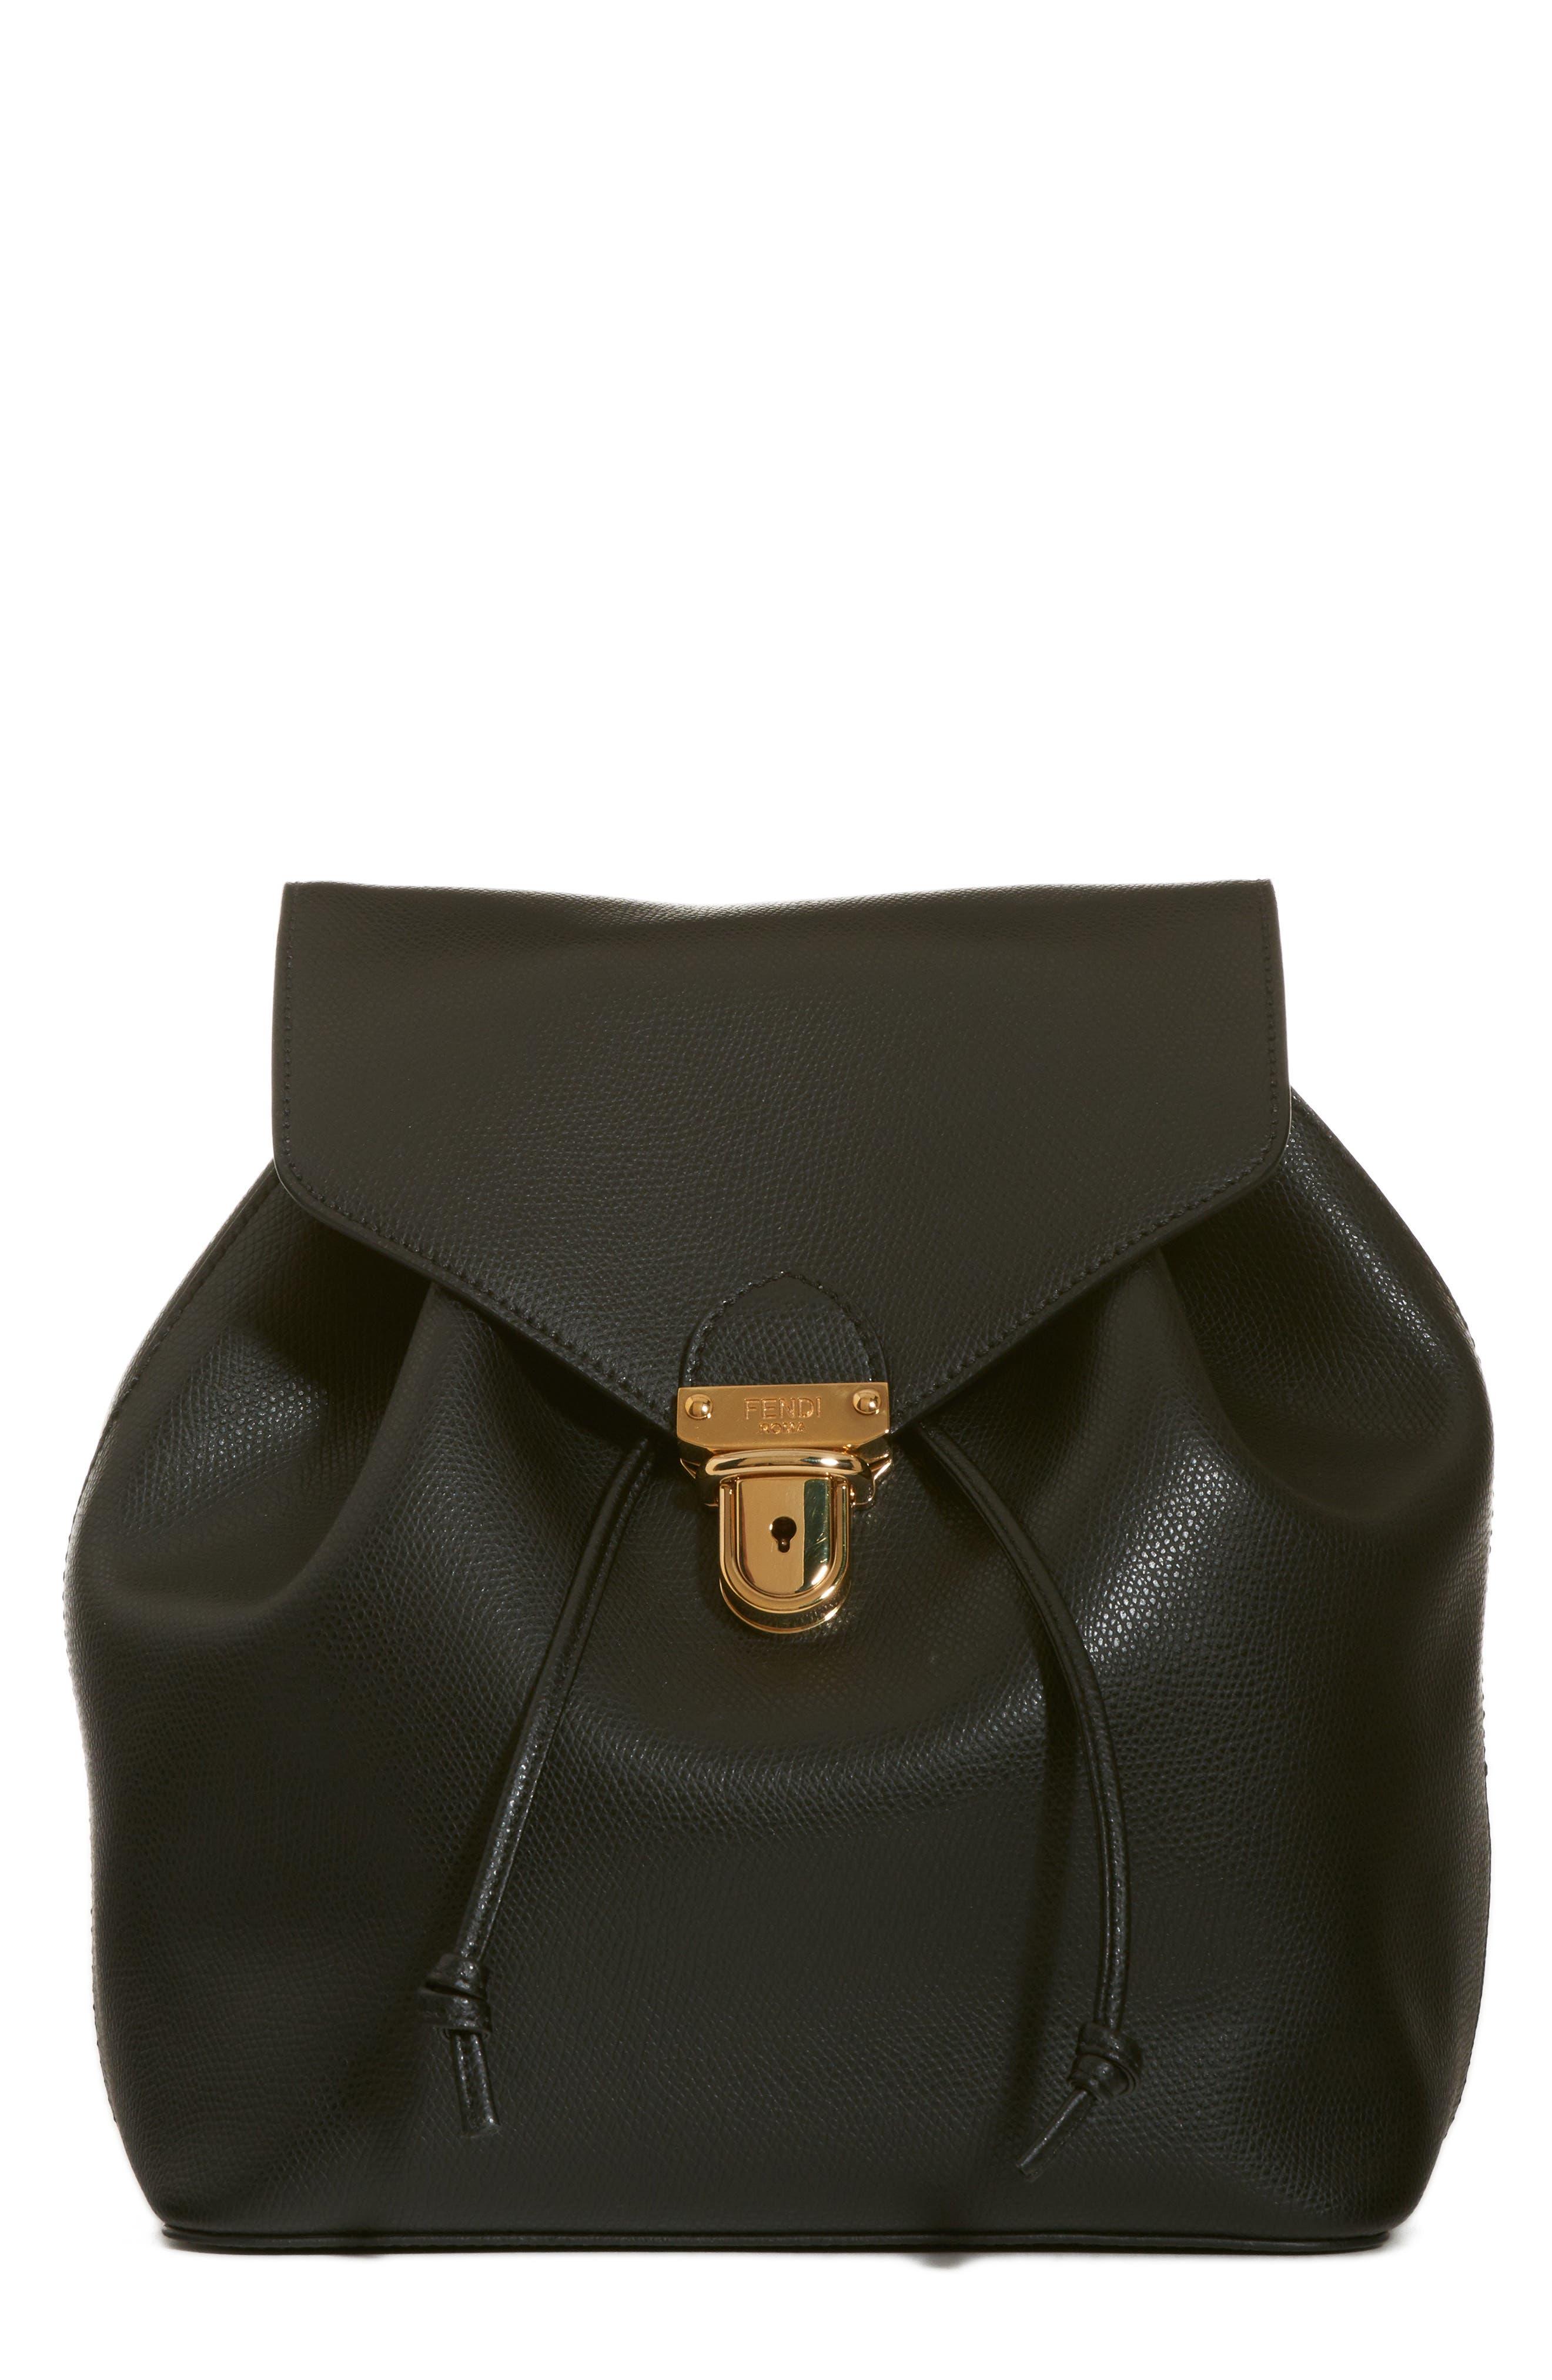 FENDI Cruise Calfskin Leather Backpack, Main, color, 006